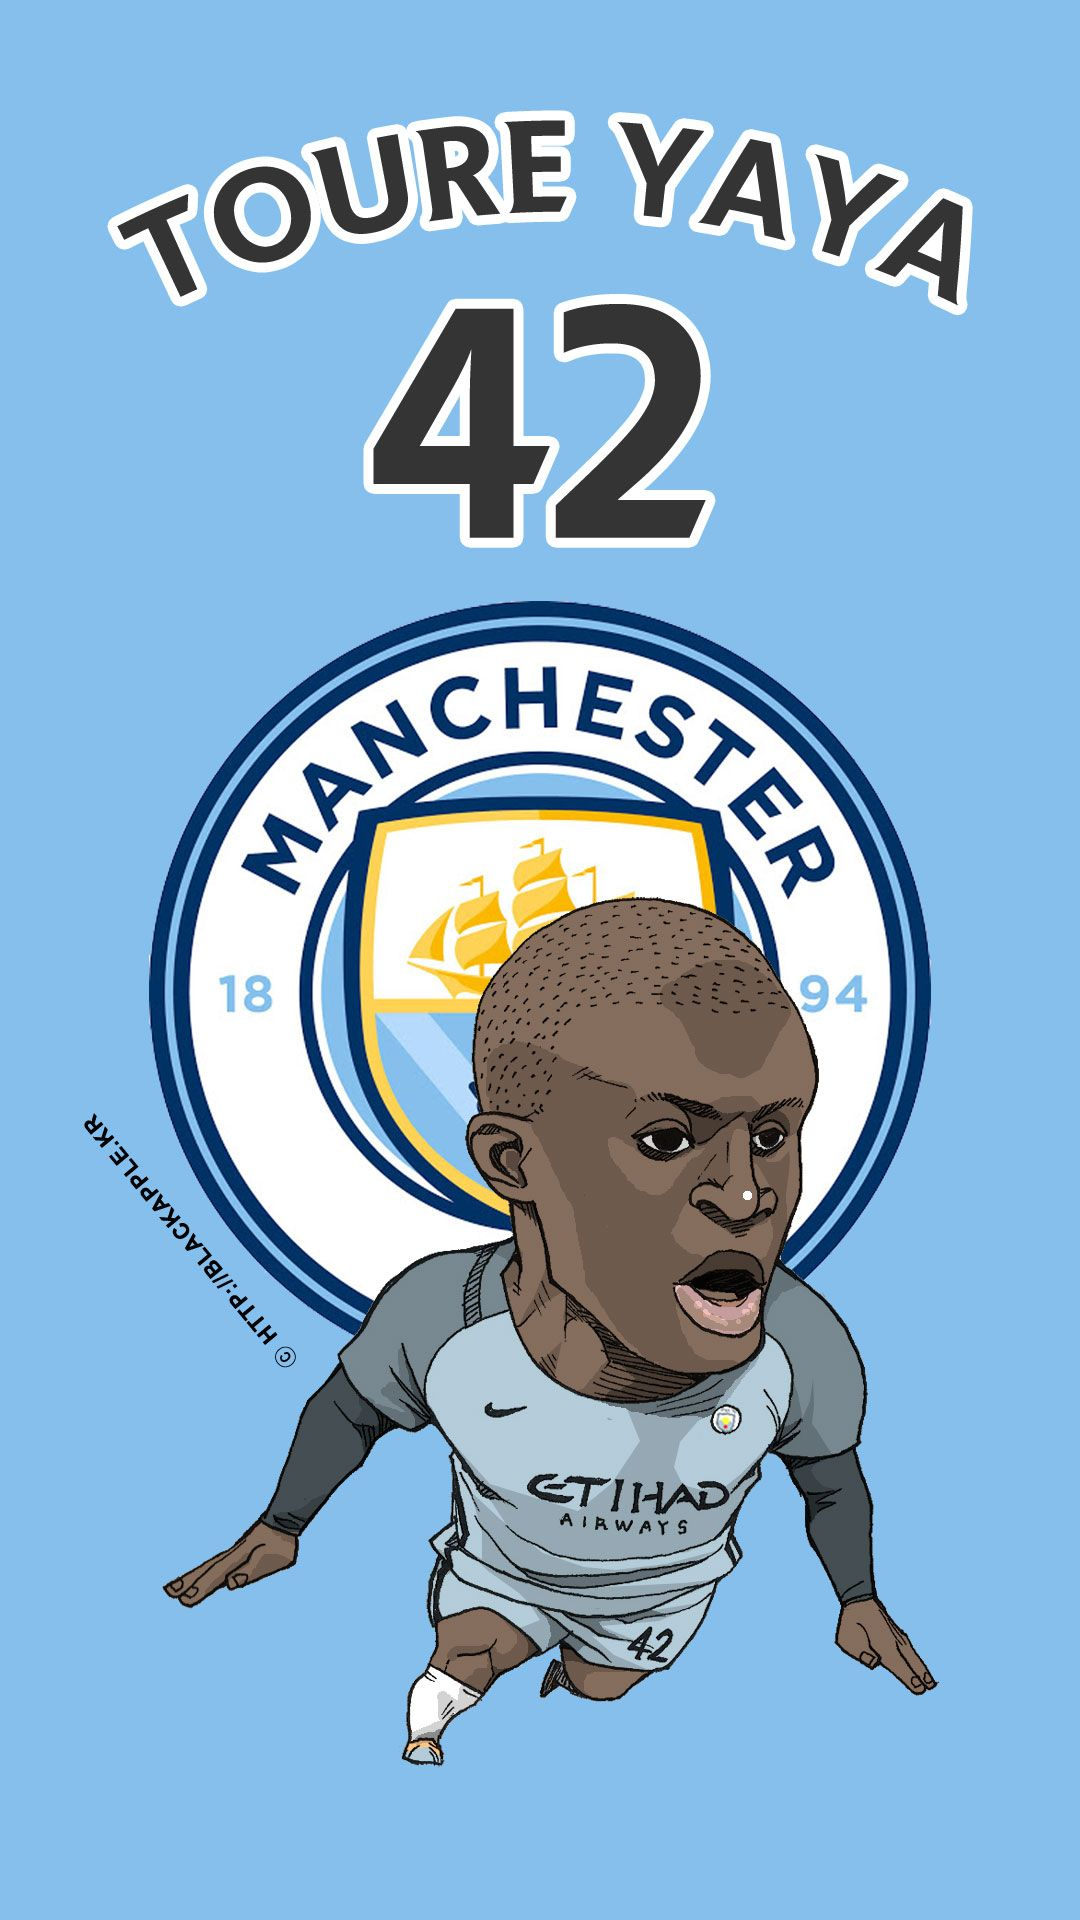 List of Latest Manchester United Wallpapers IPad Manchester City No.42 Yaya Toure Fan Art